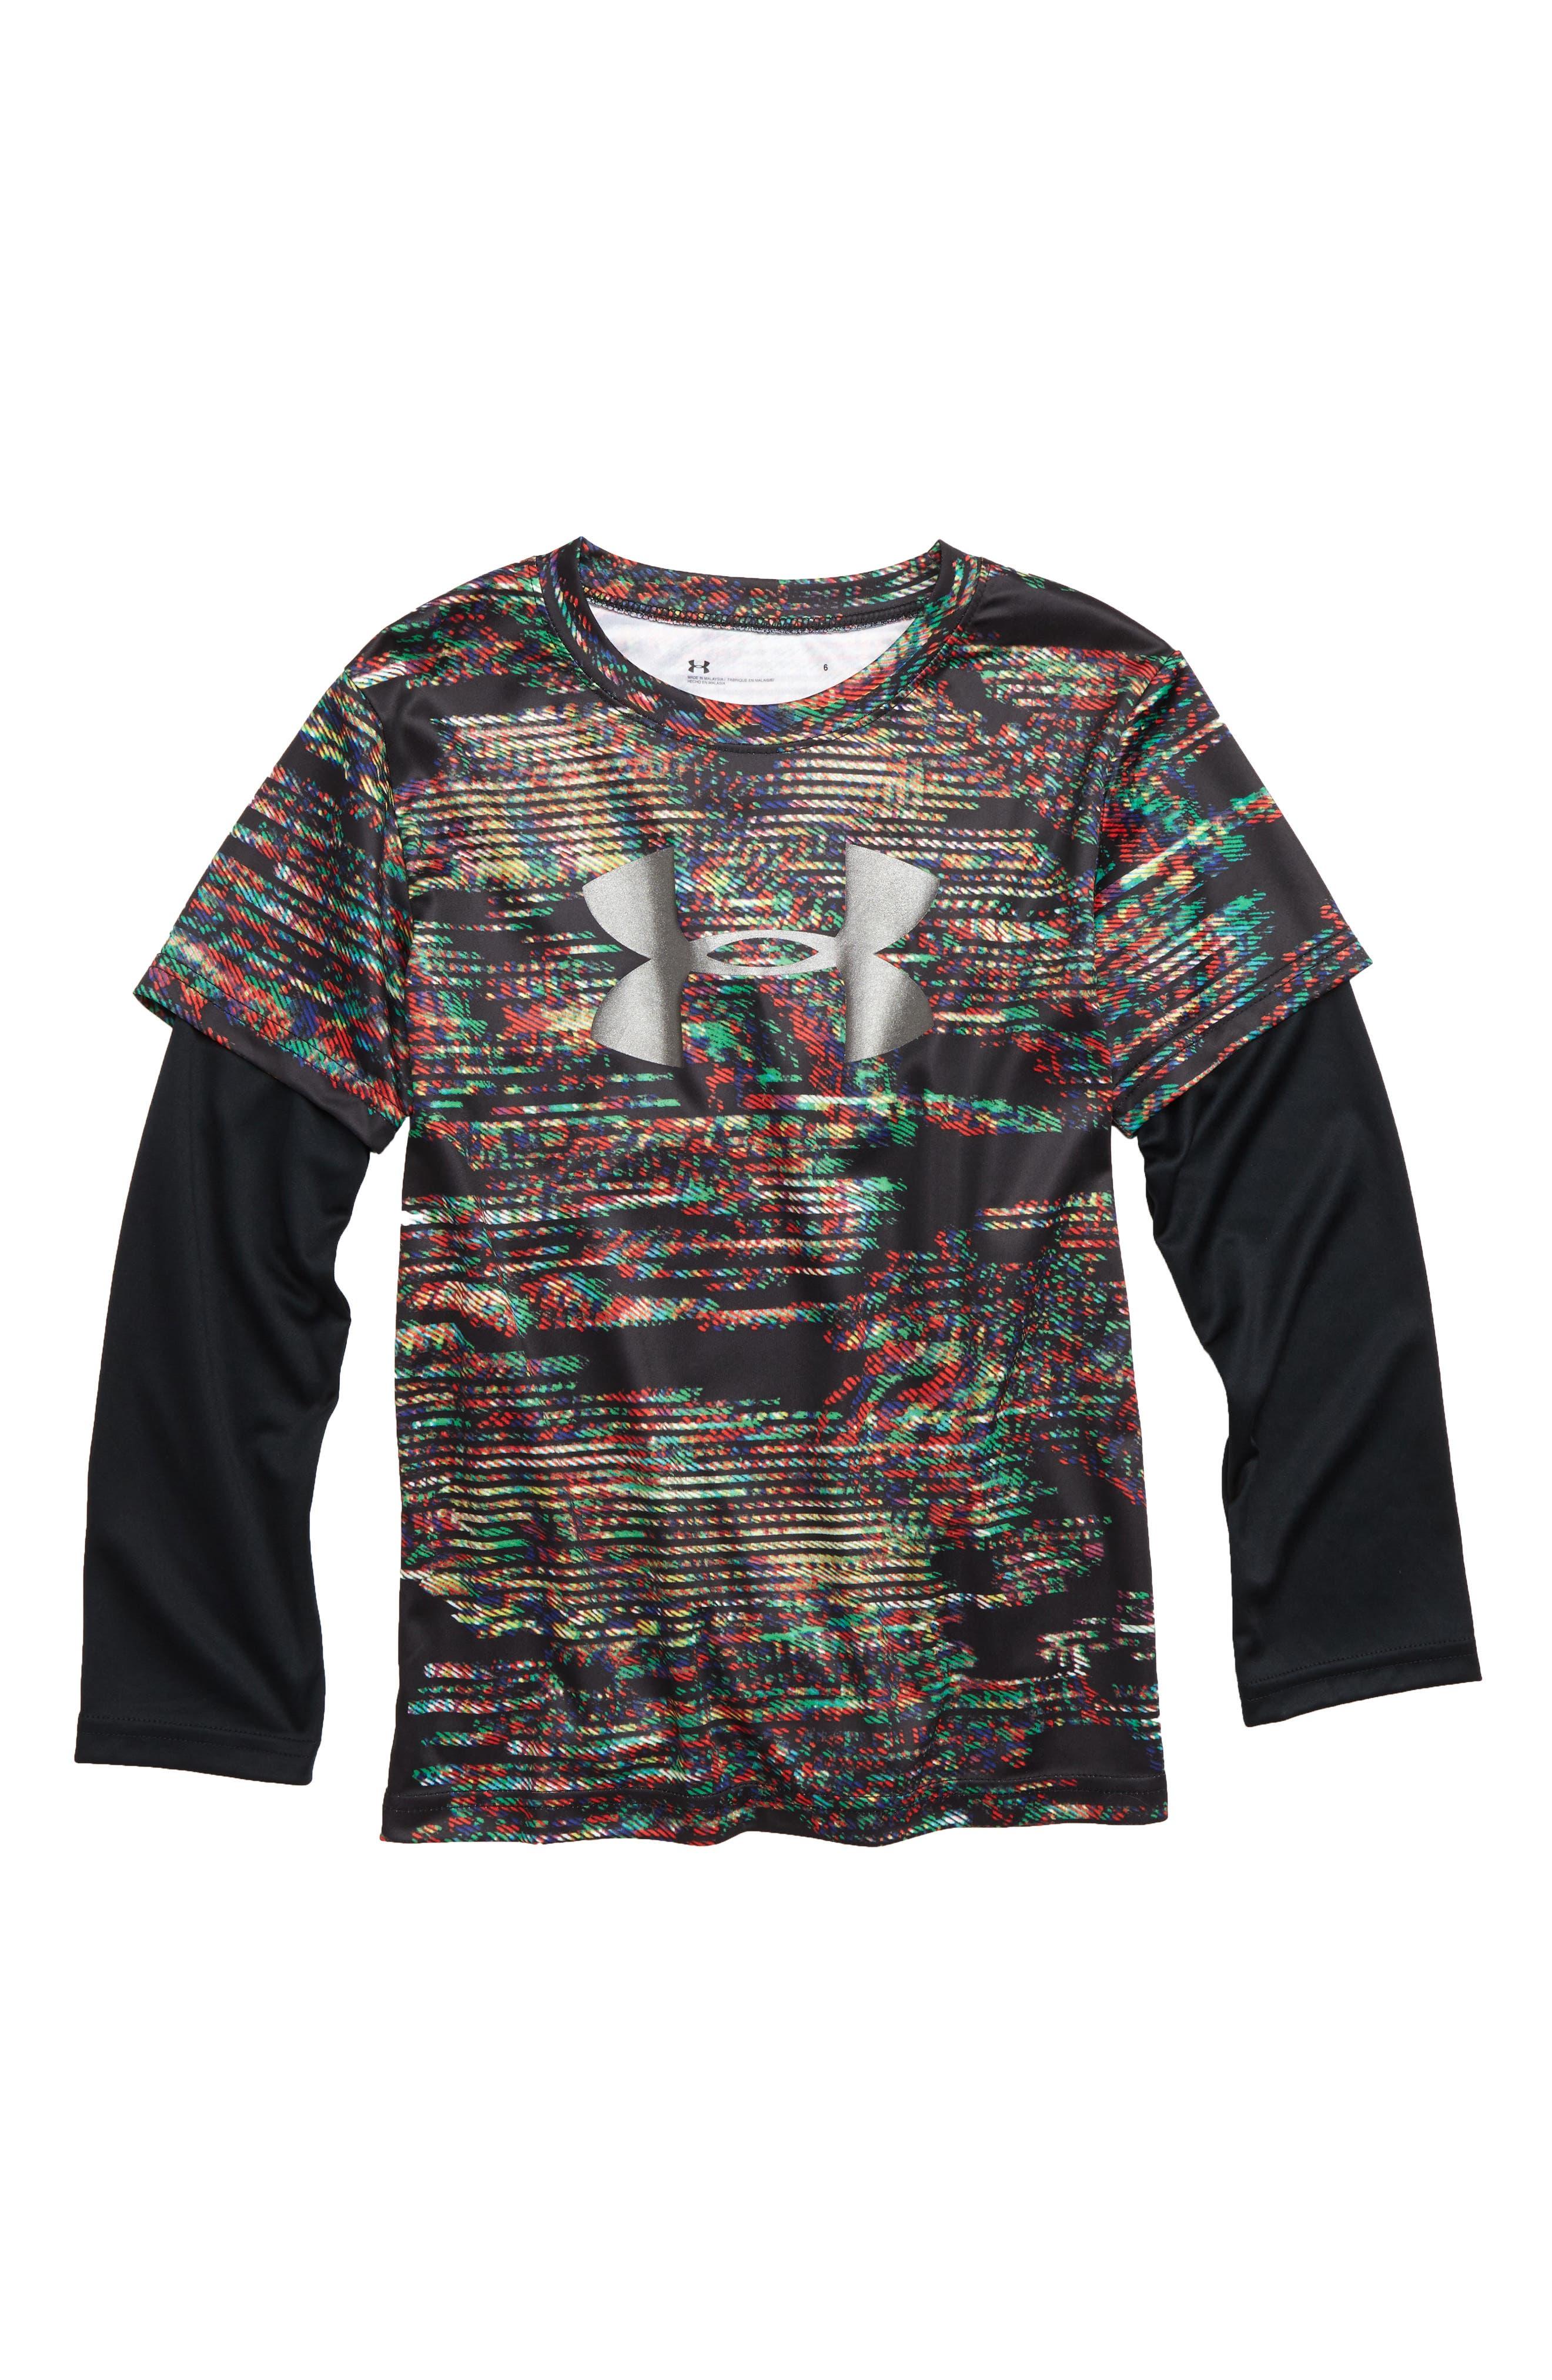 Static Digital Slider Layer T-Shirt,                             Main thumbnail 1, color,                             BLACK